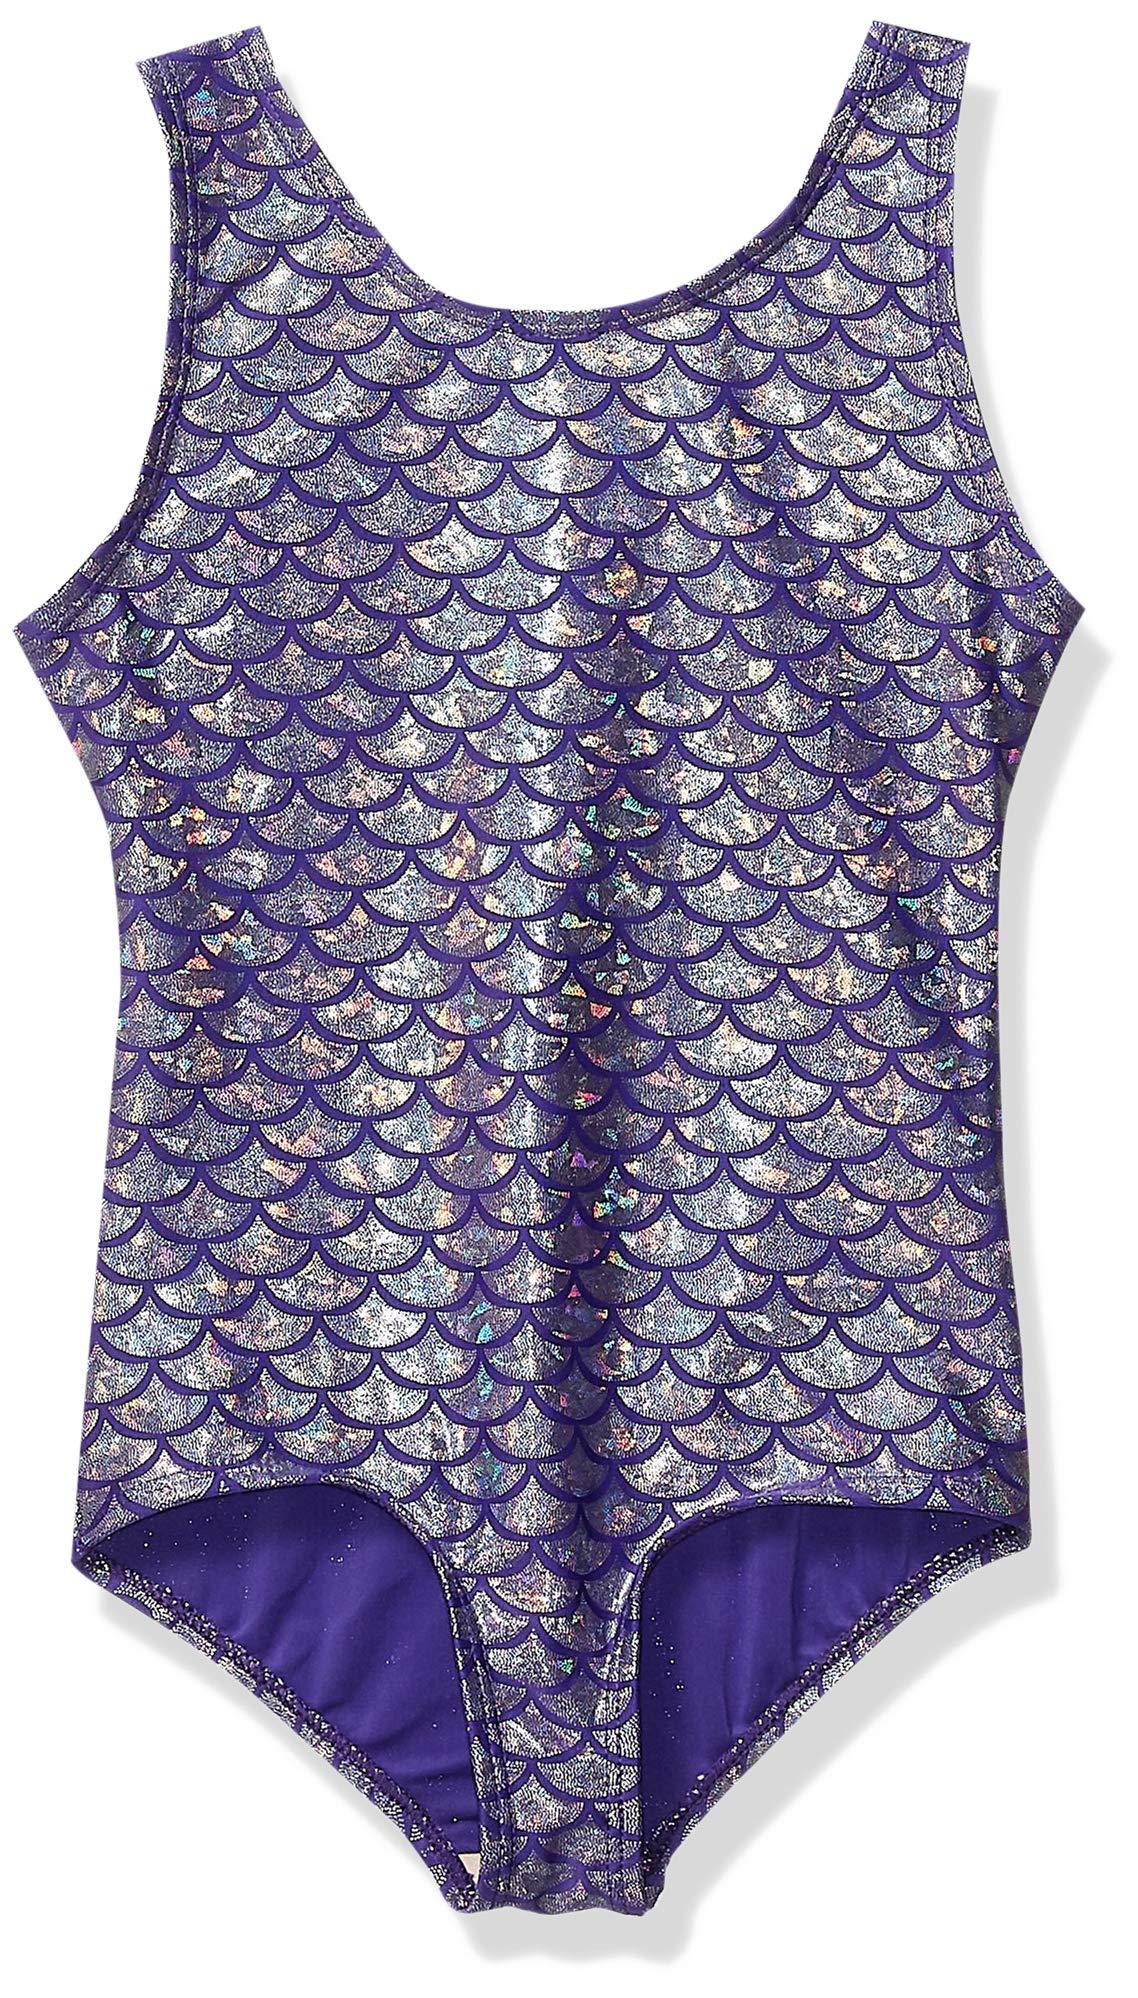 Danskin Girls Big Gymnastics Leotard Purplesilver Mermaid 54236 Medium 810